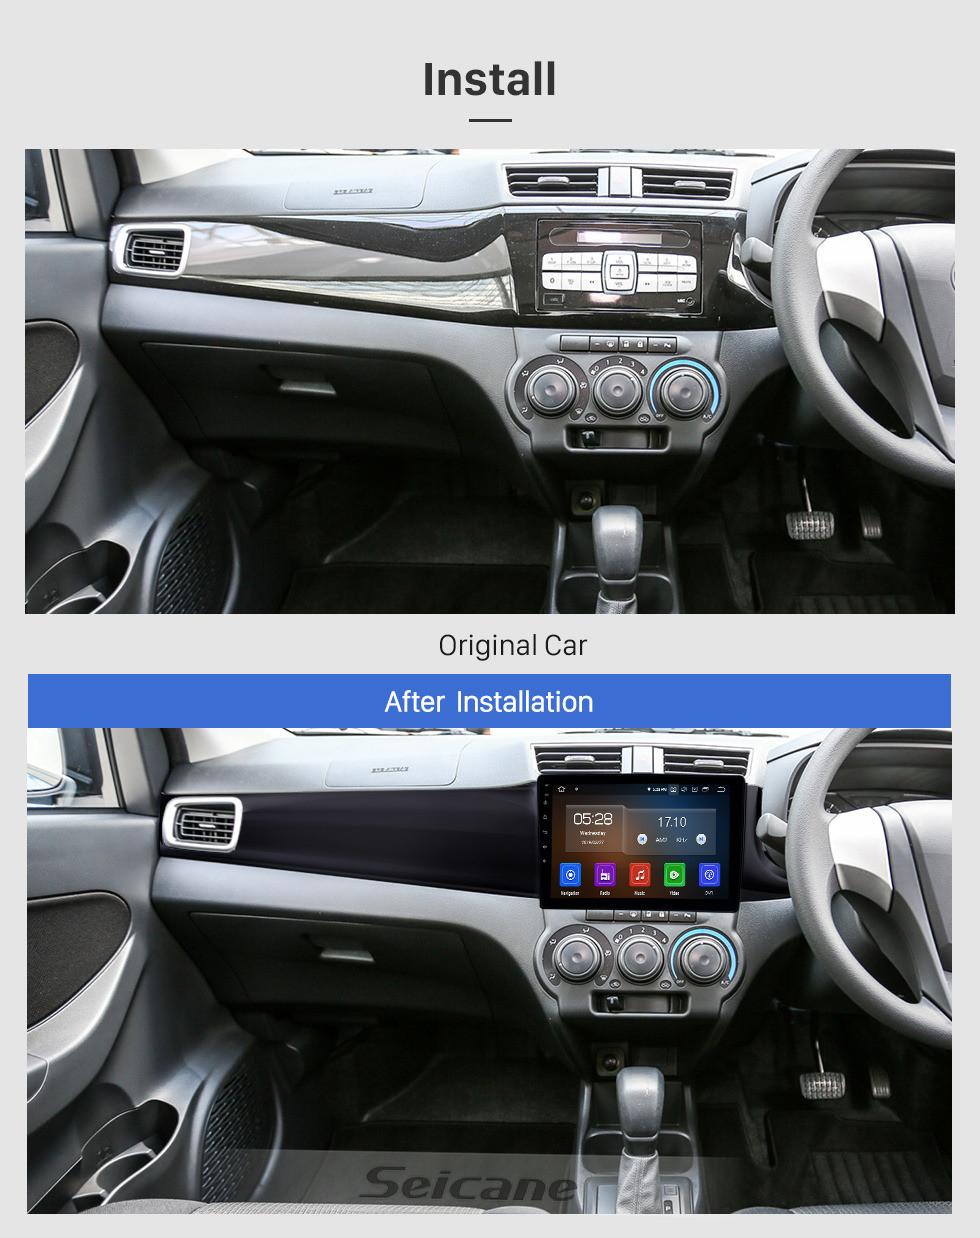 Seicane 10.1 inch Android 10.0 Radio for 2016-2019 Perodua Bezza Bluetooth HD Touchscreen GPS Navigation Carplay USB support TPMS OBD2 Digital TV